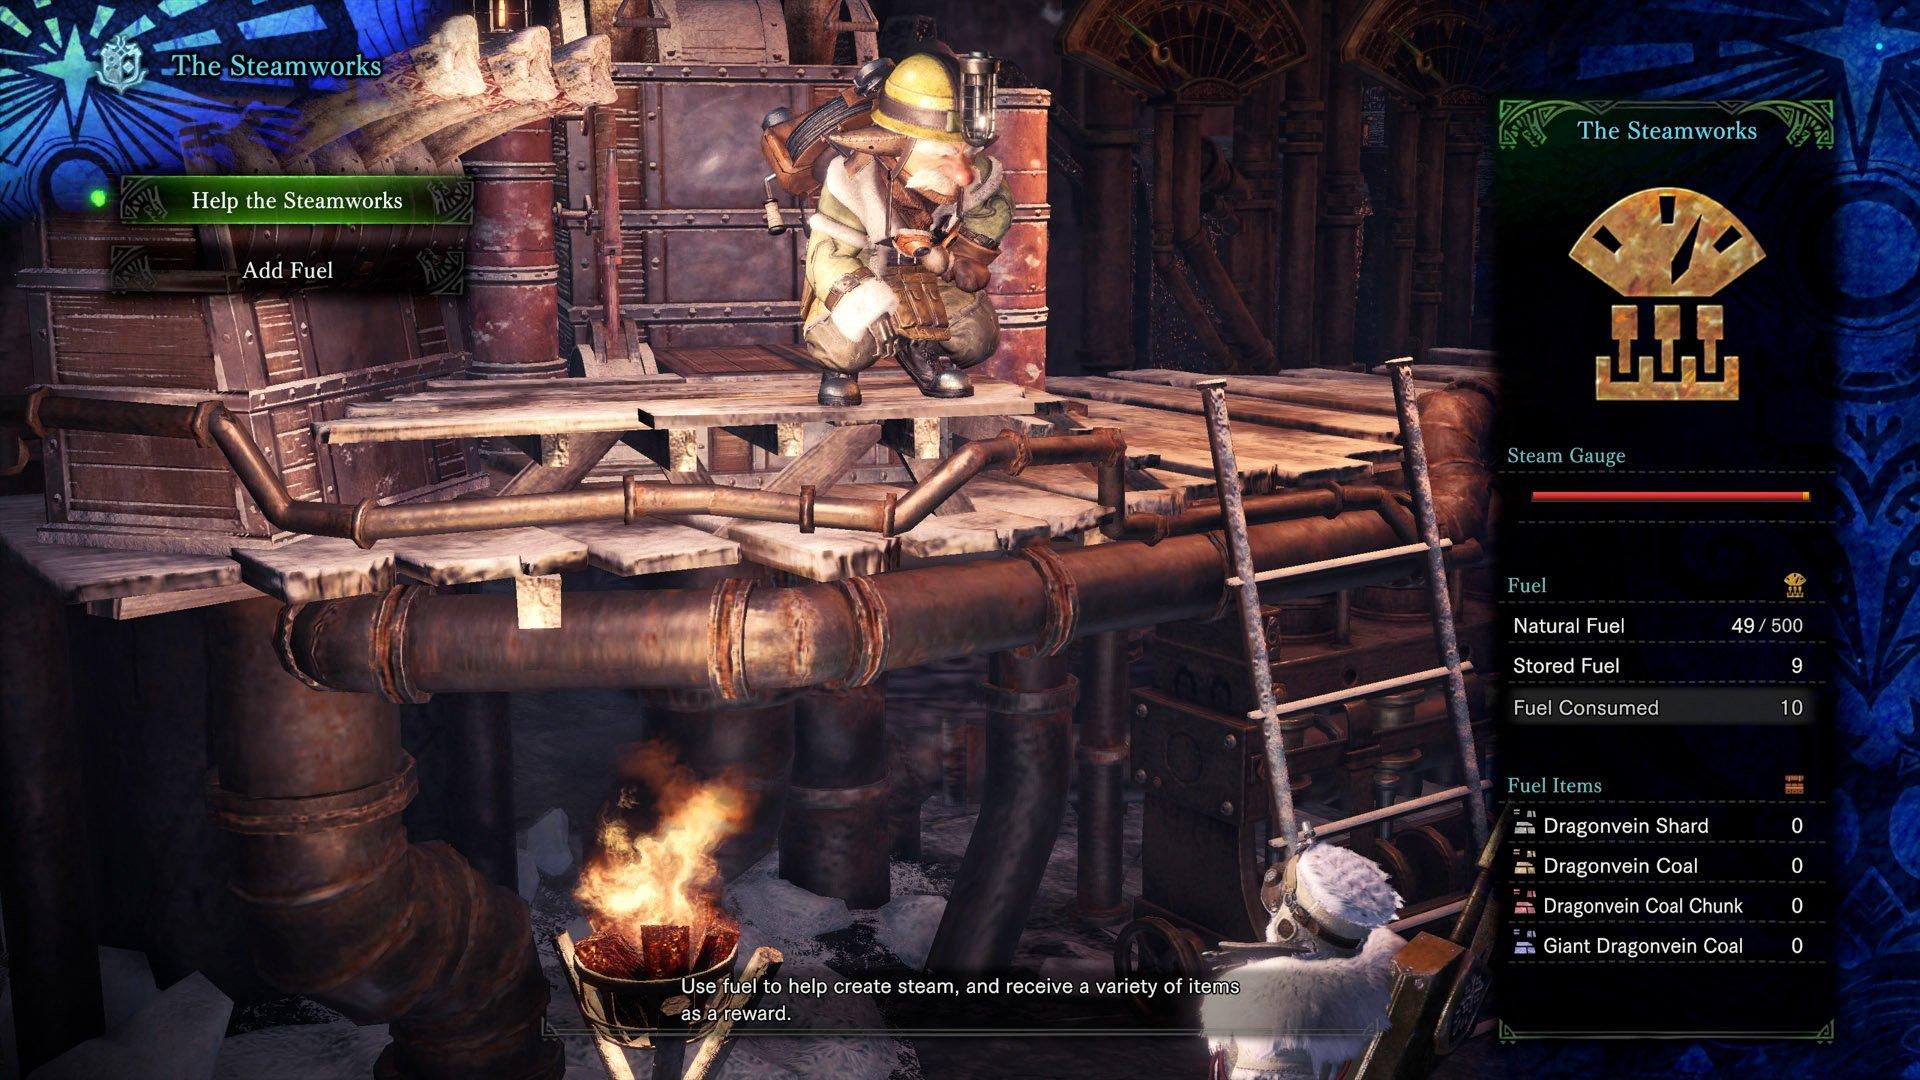 How to use Steamworks in Monster Hunter World: Iceborne